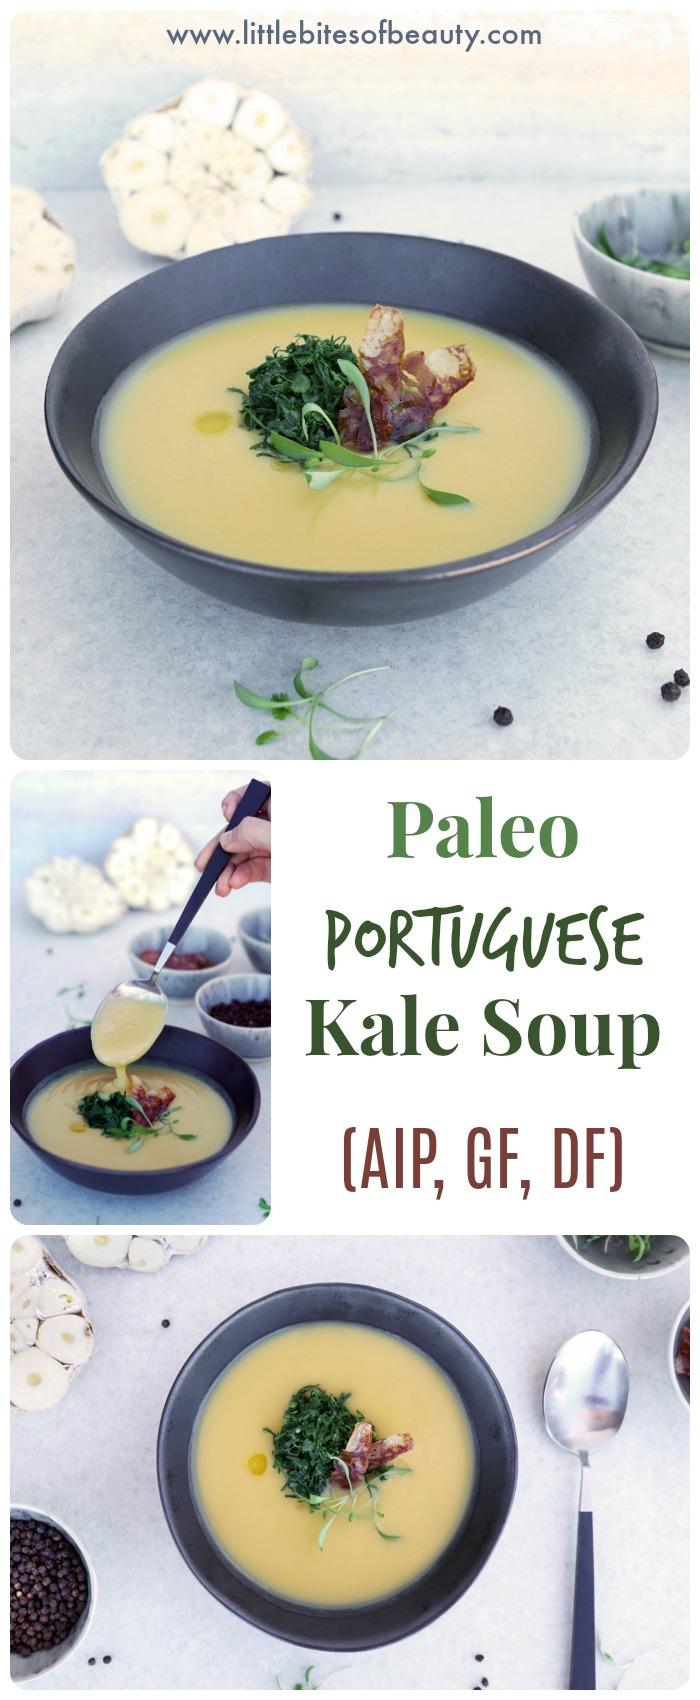 Paleo Portuguese Kale Soup (AIP, Dairy & Gluten Free)